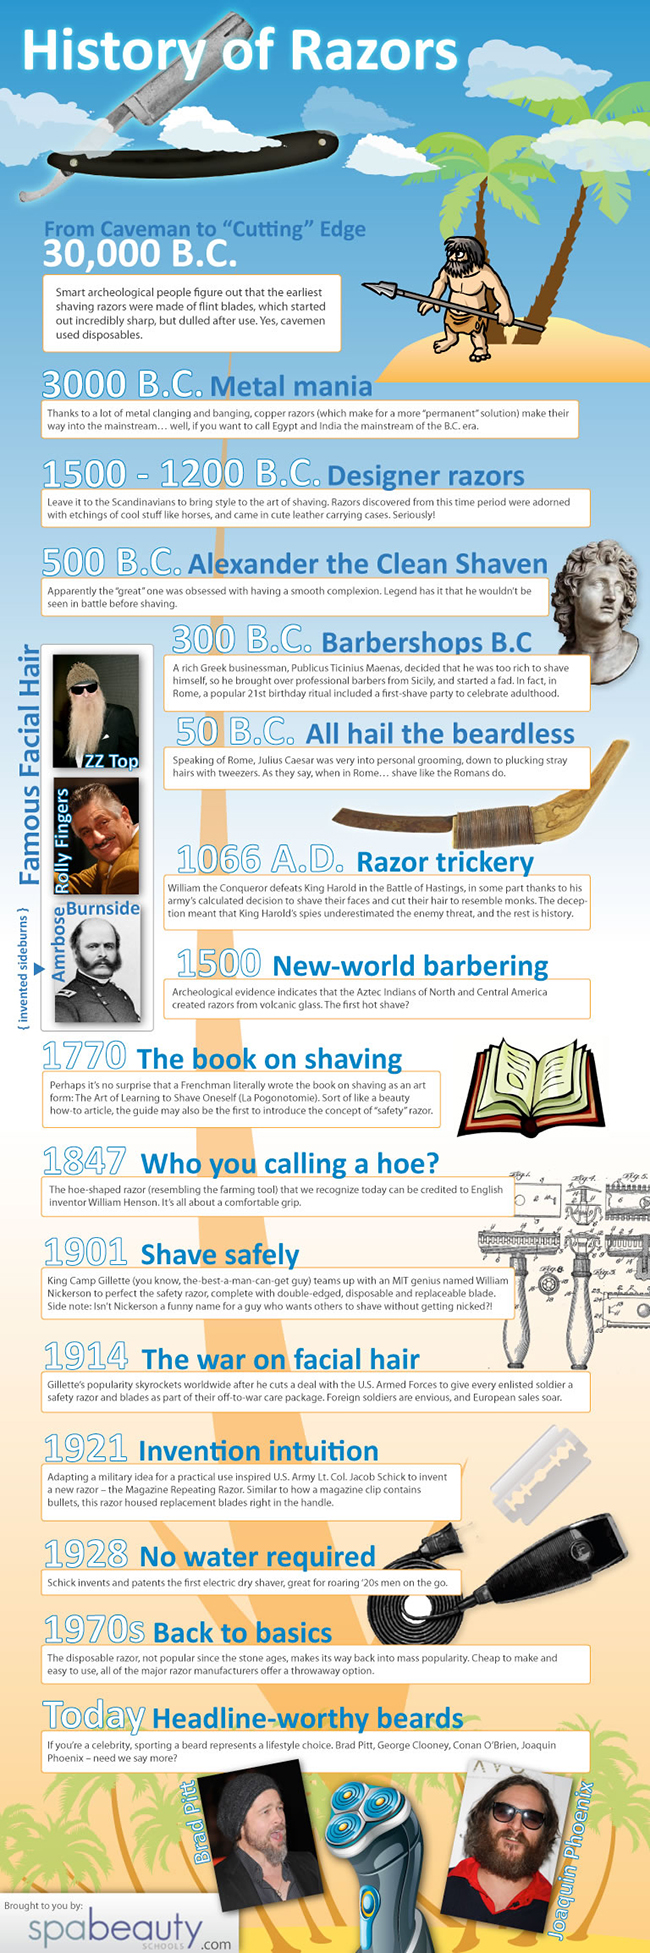 Histoire du rasage